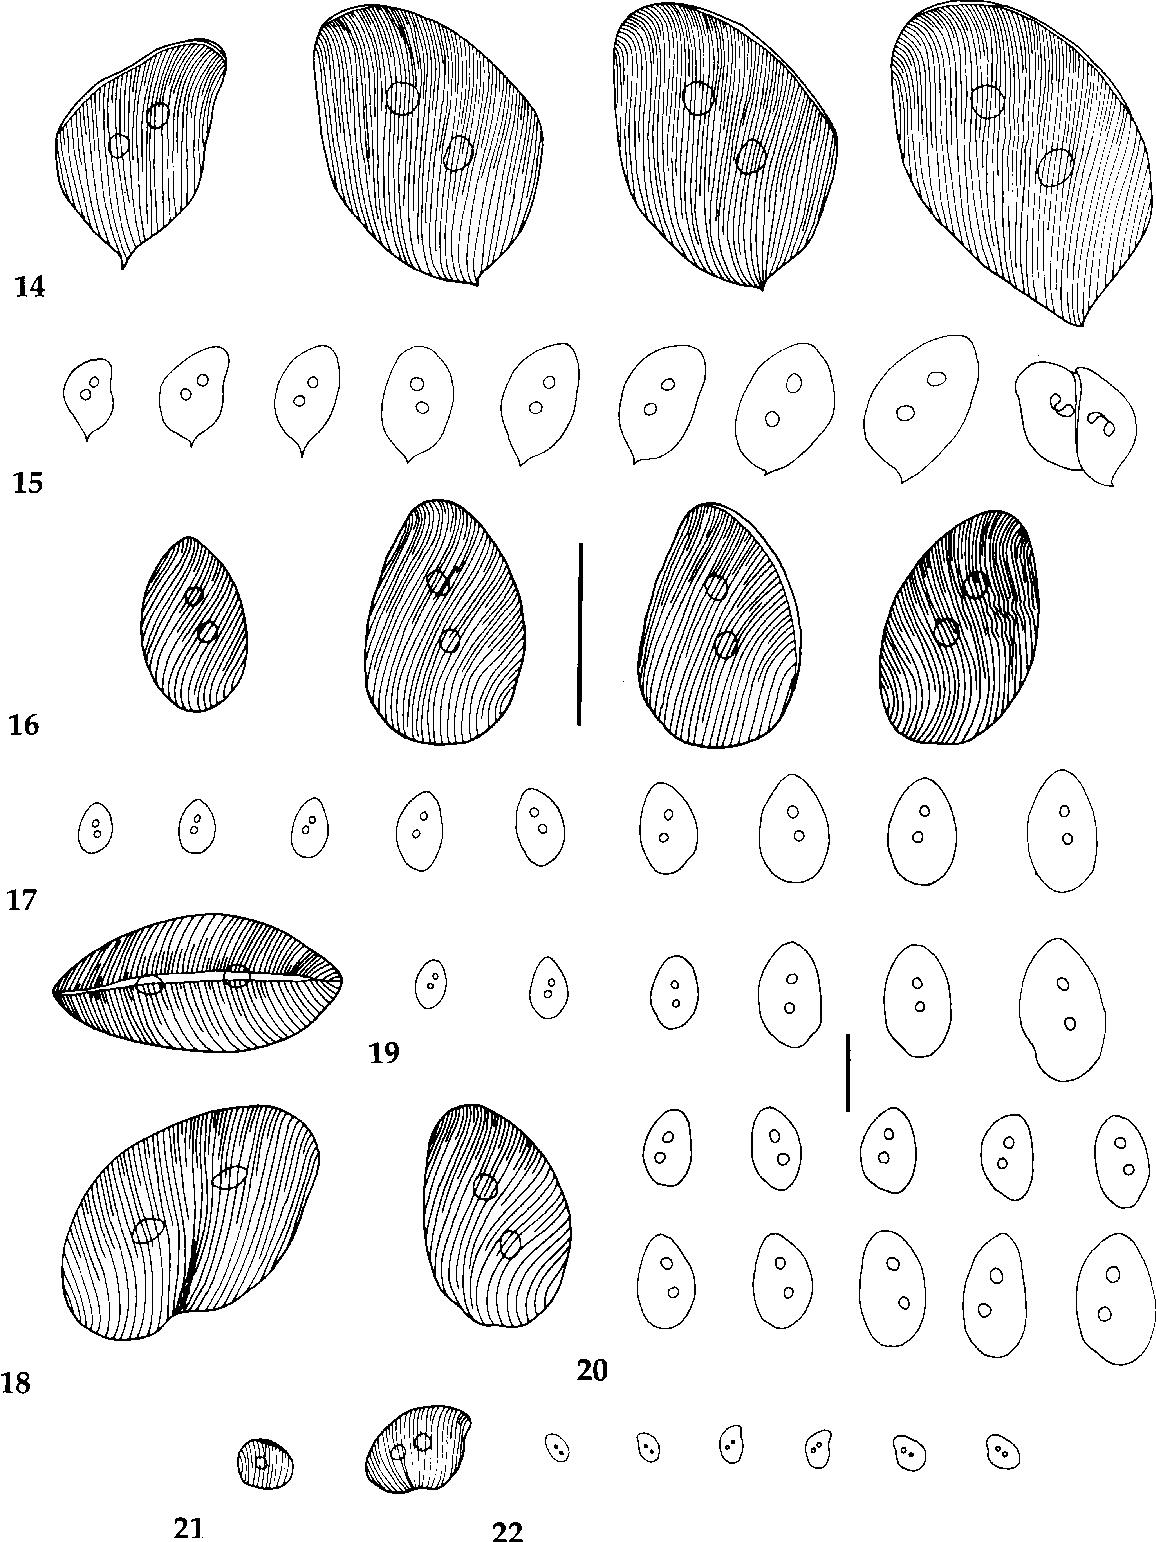 figure 14-22